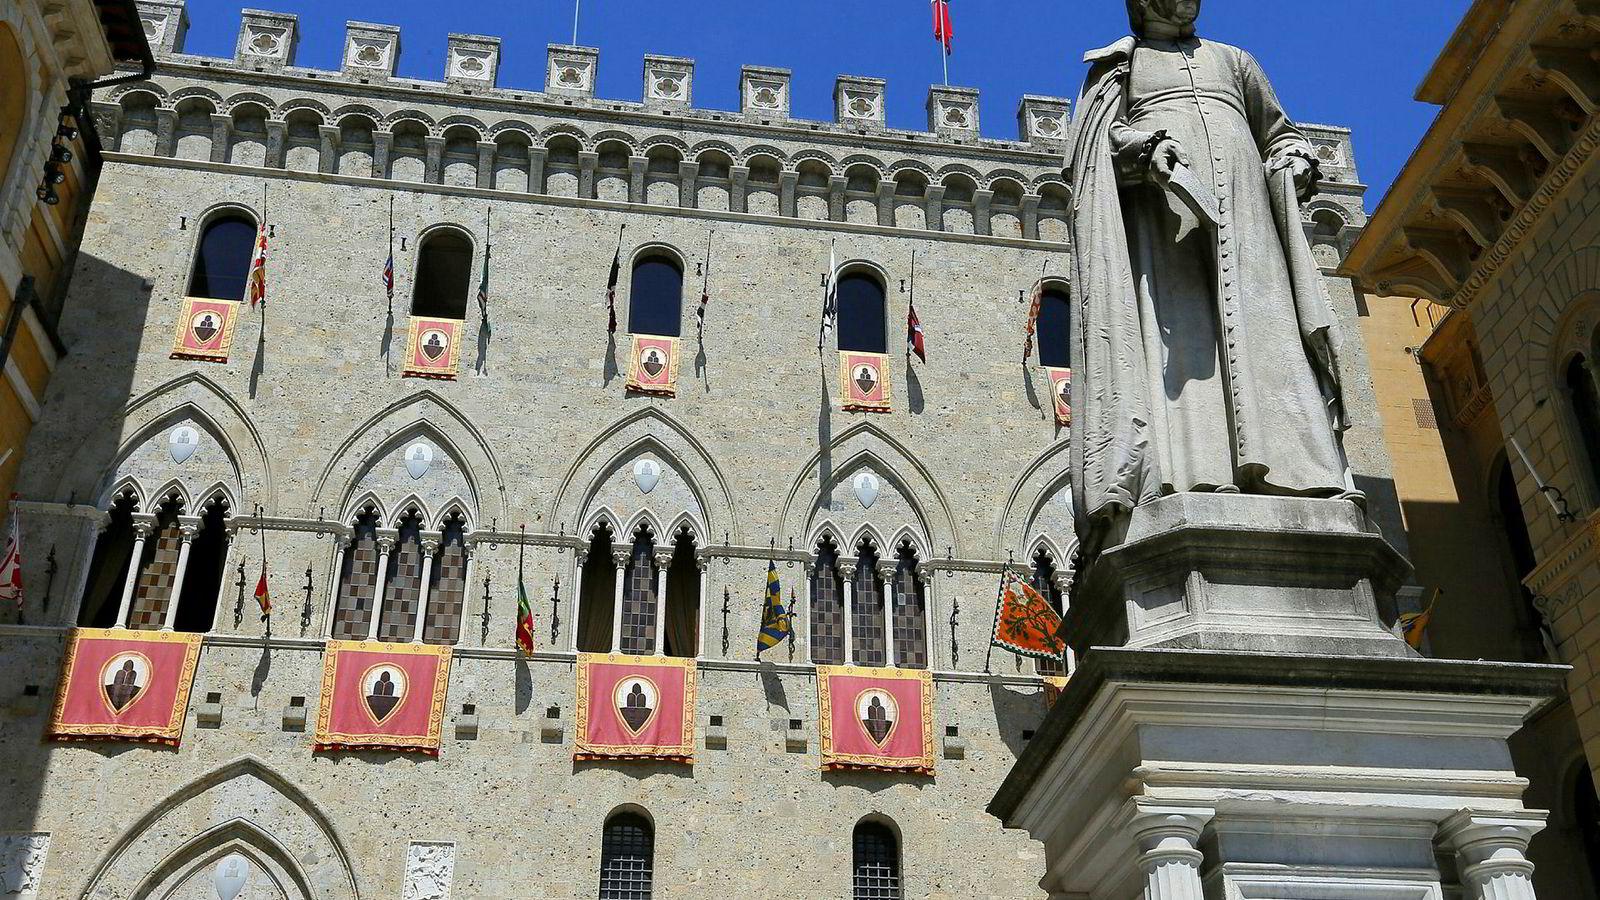 Hovedkvarteret til verdens eldste bank Monte dei Paschi di Siena i Italia.